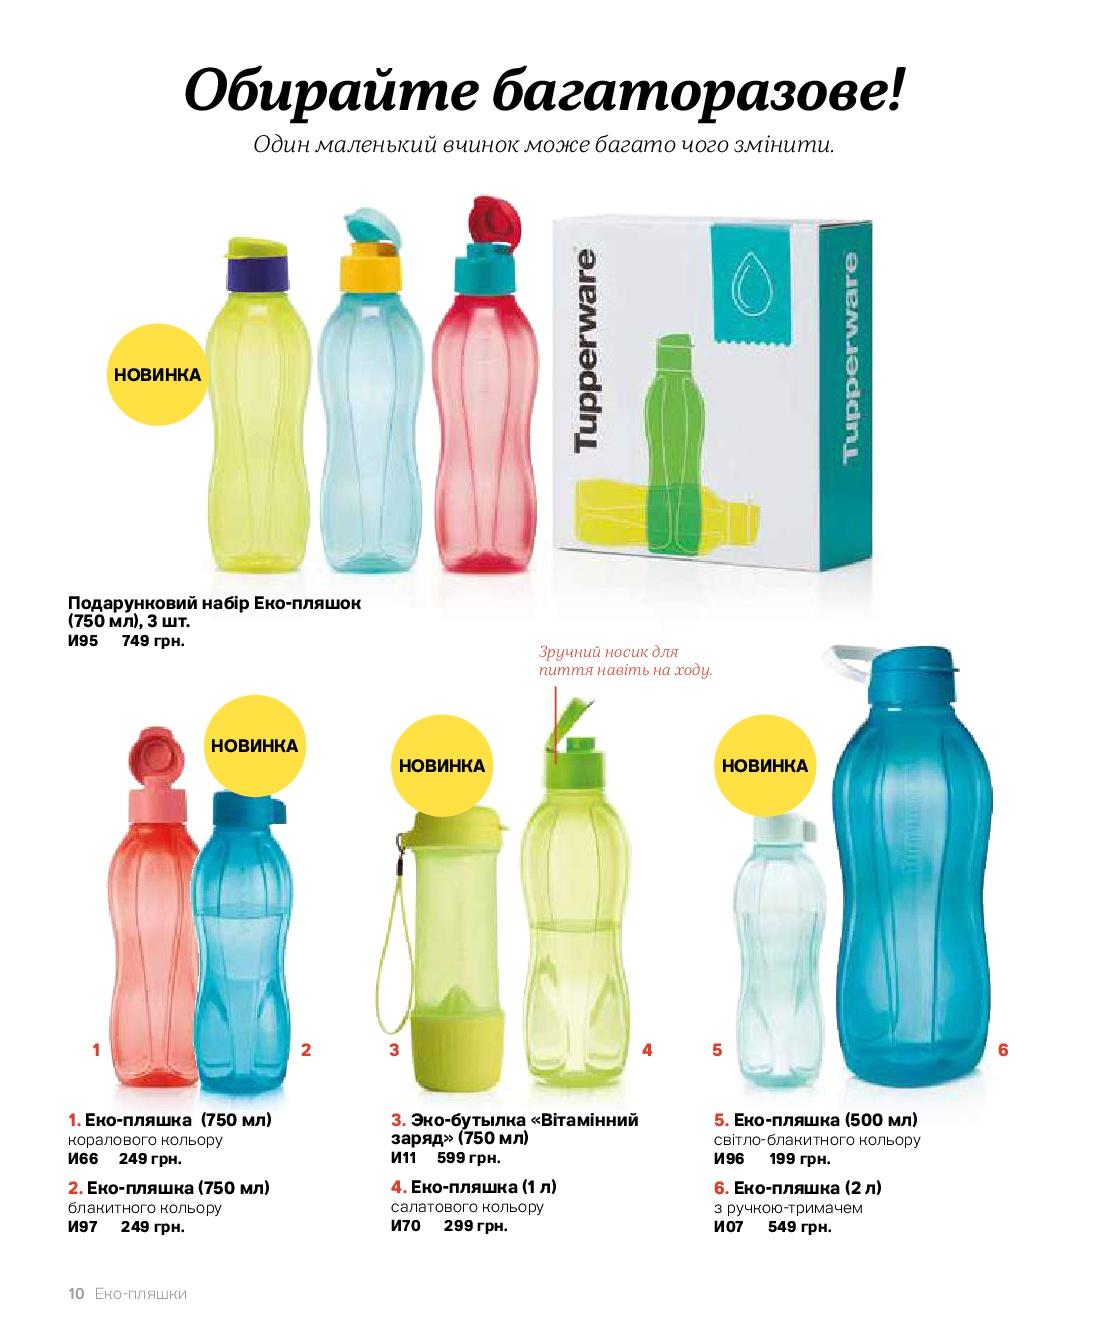 Страница каталога 9. Бутылки тапервер все цены и объемы